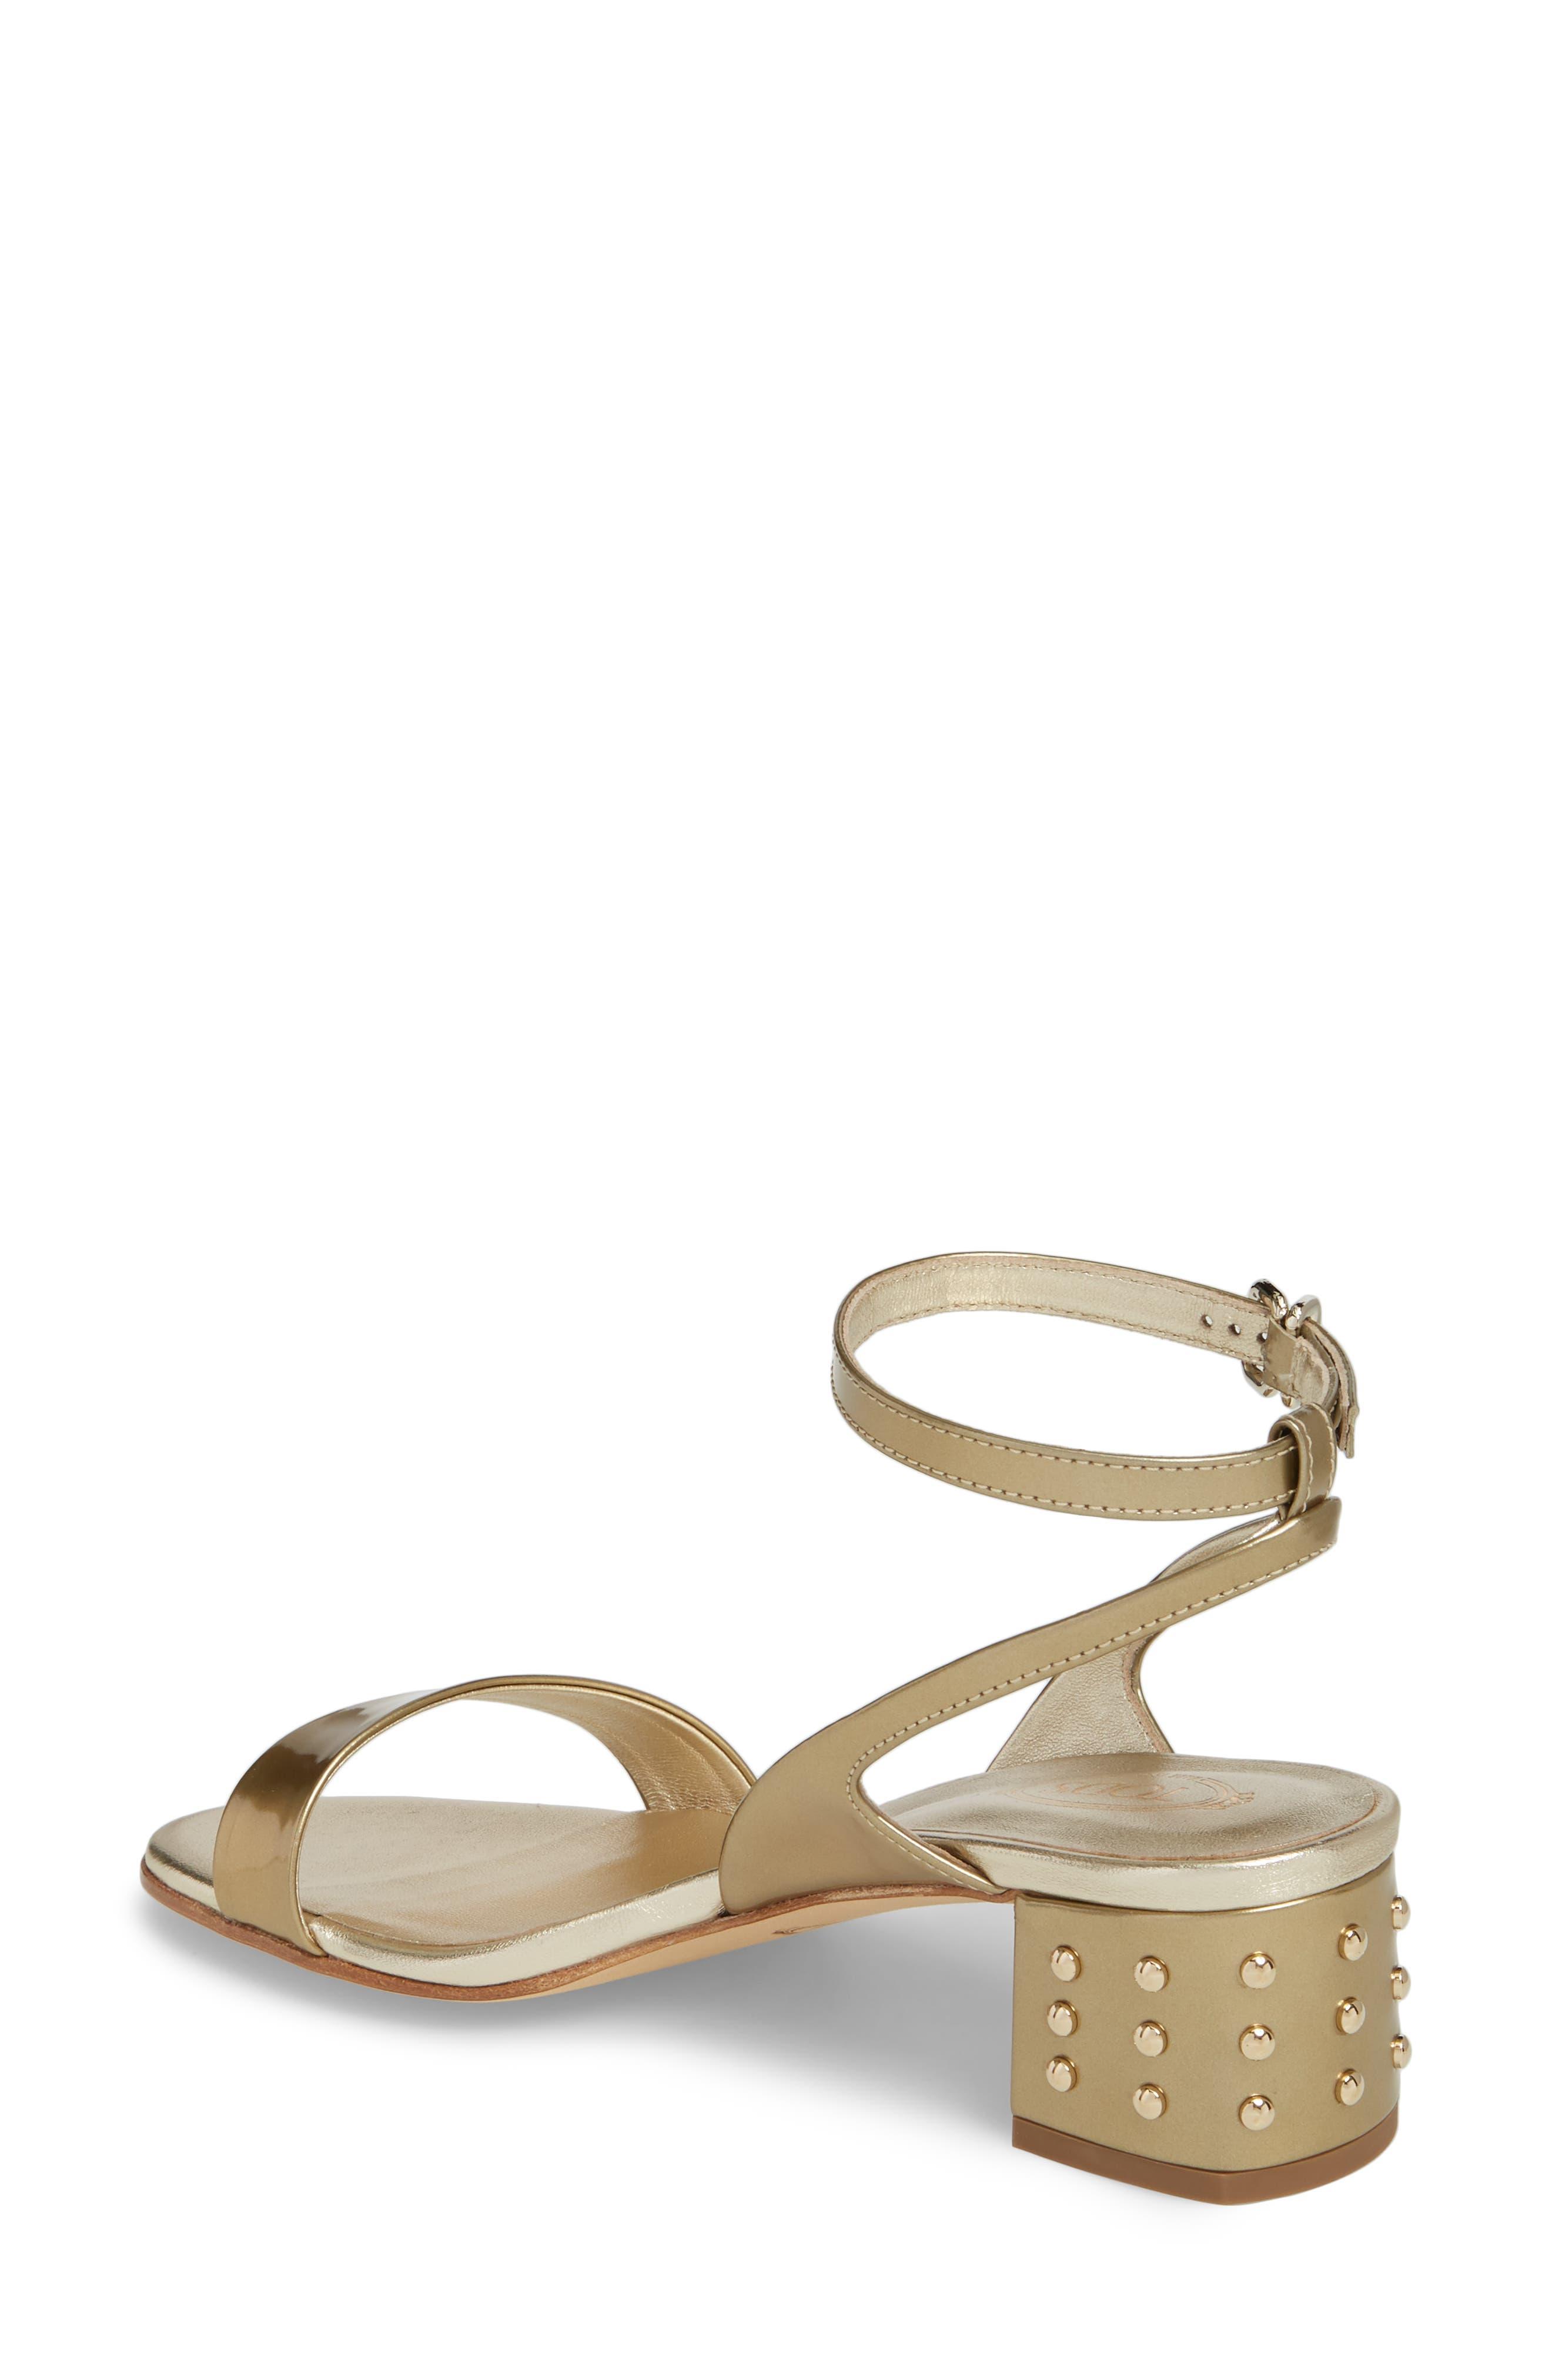 Gommini Block Heel Sandal,                             Alternate thumbnail 2, color,                             Gold